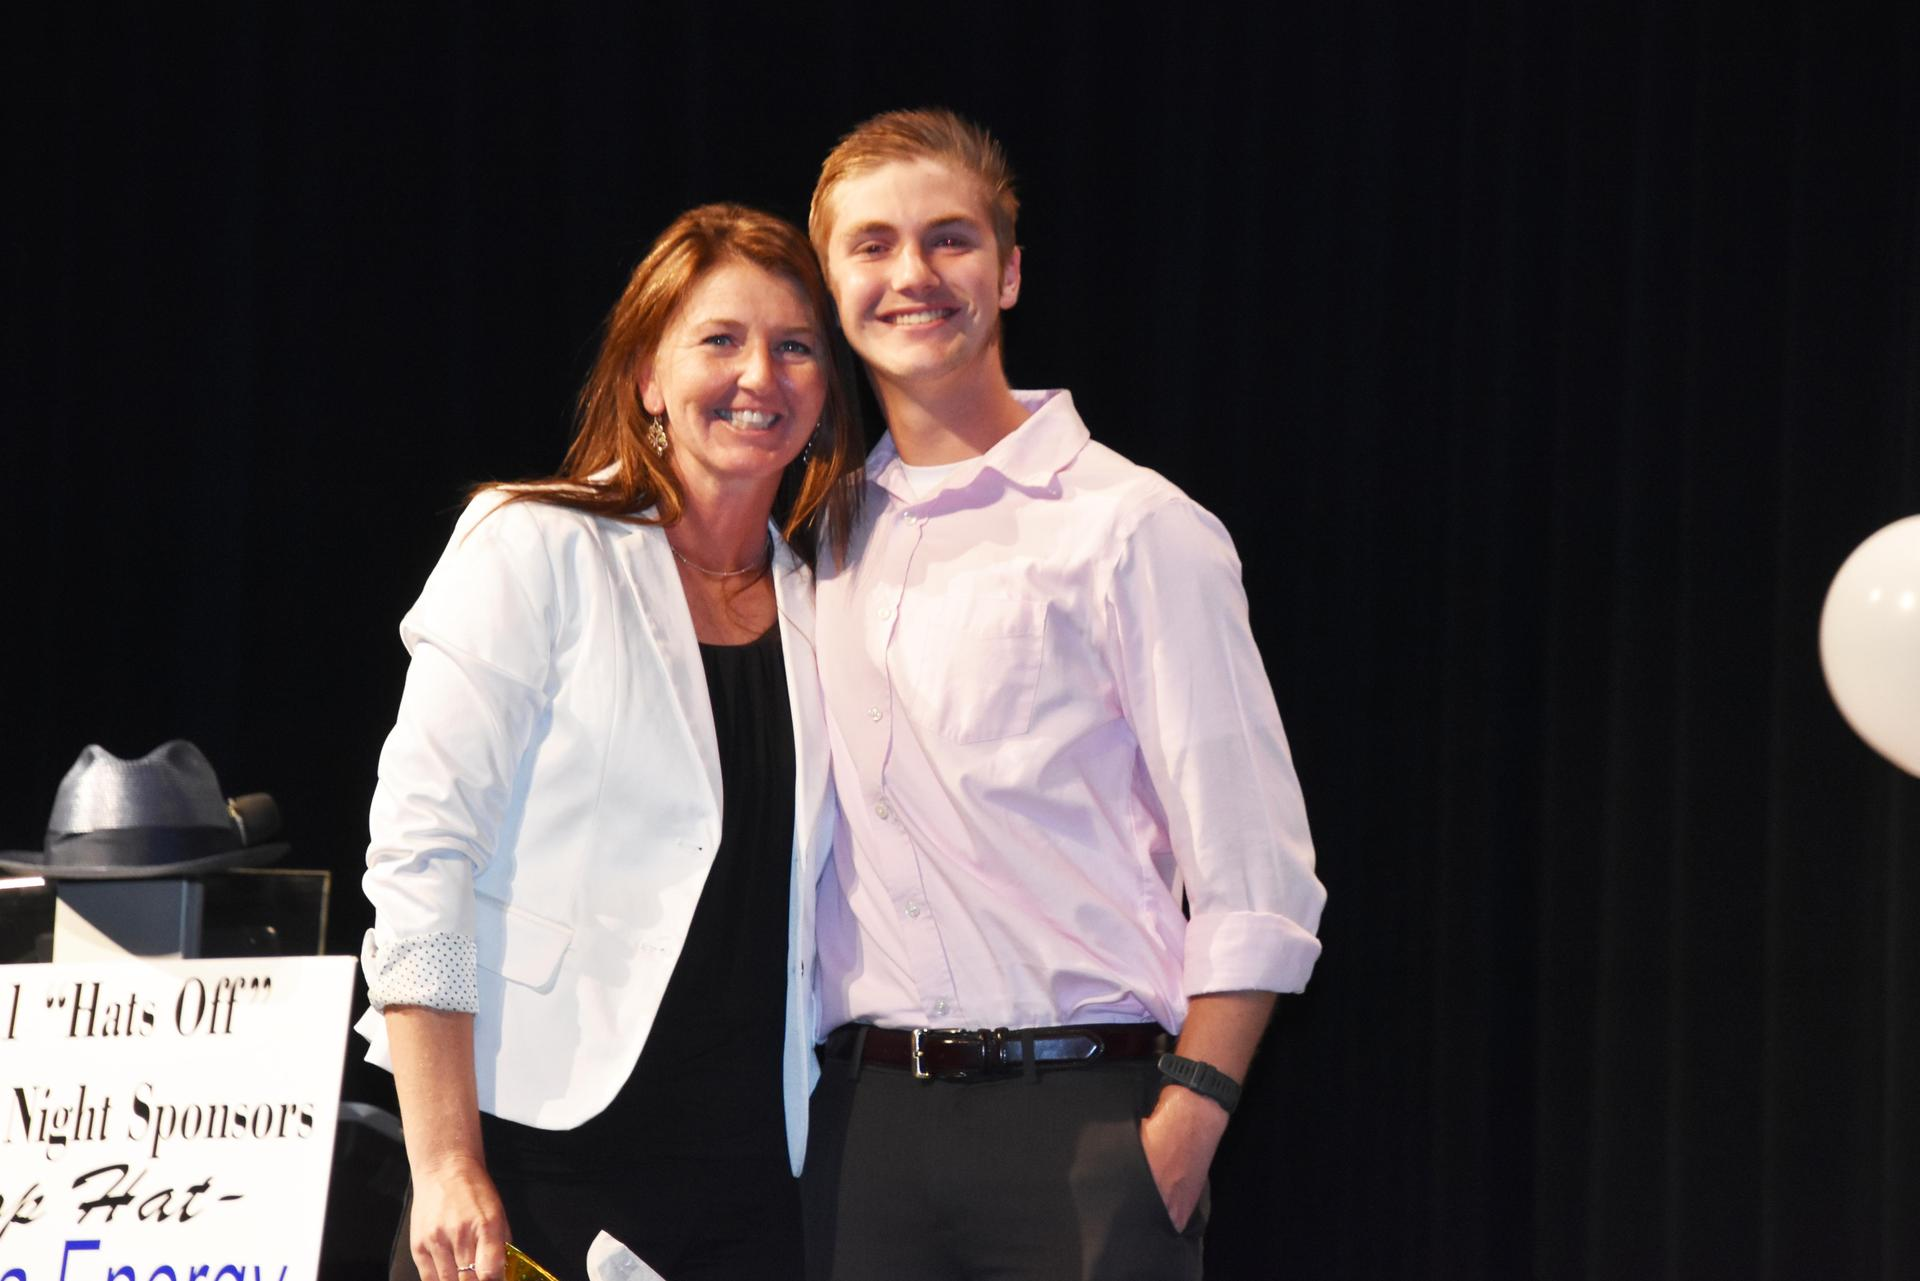 Cameron Vieck and Loretta Haley